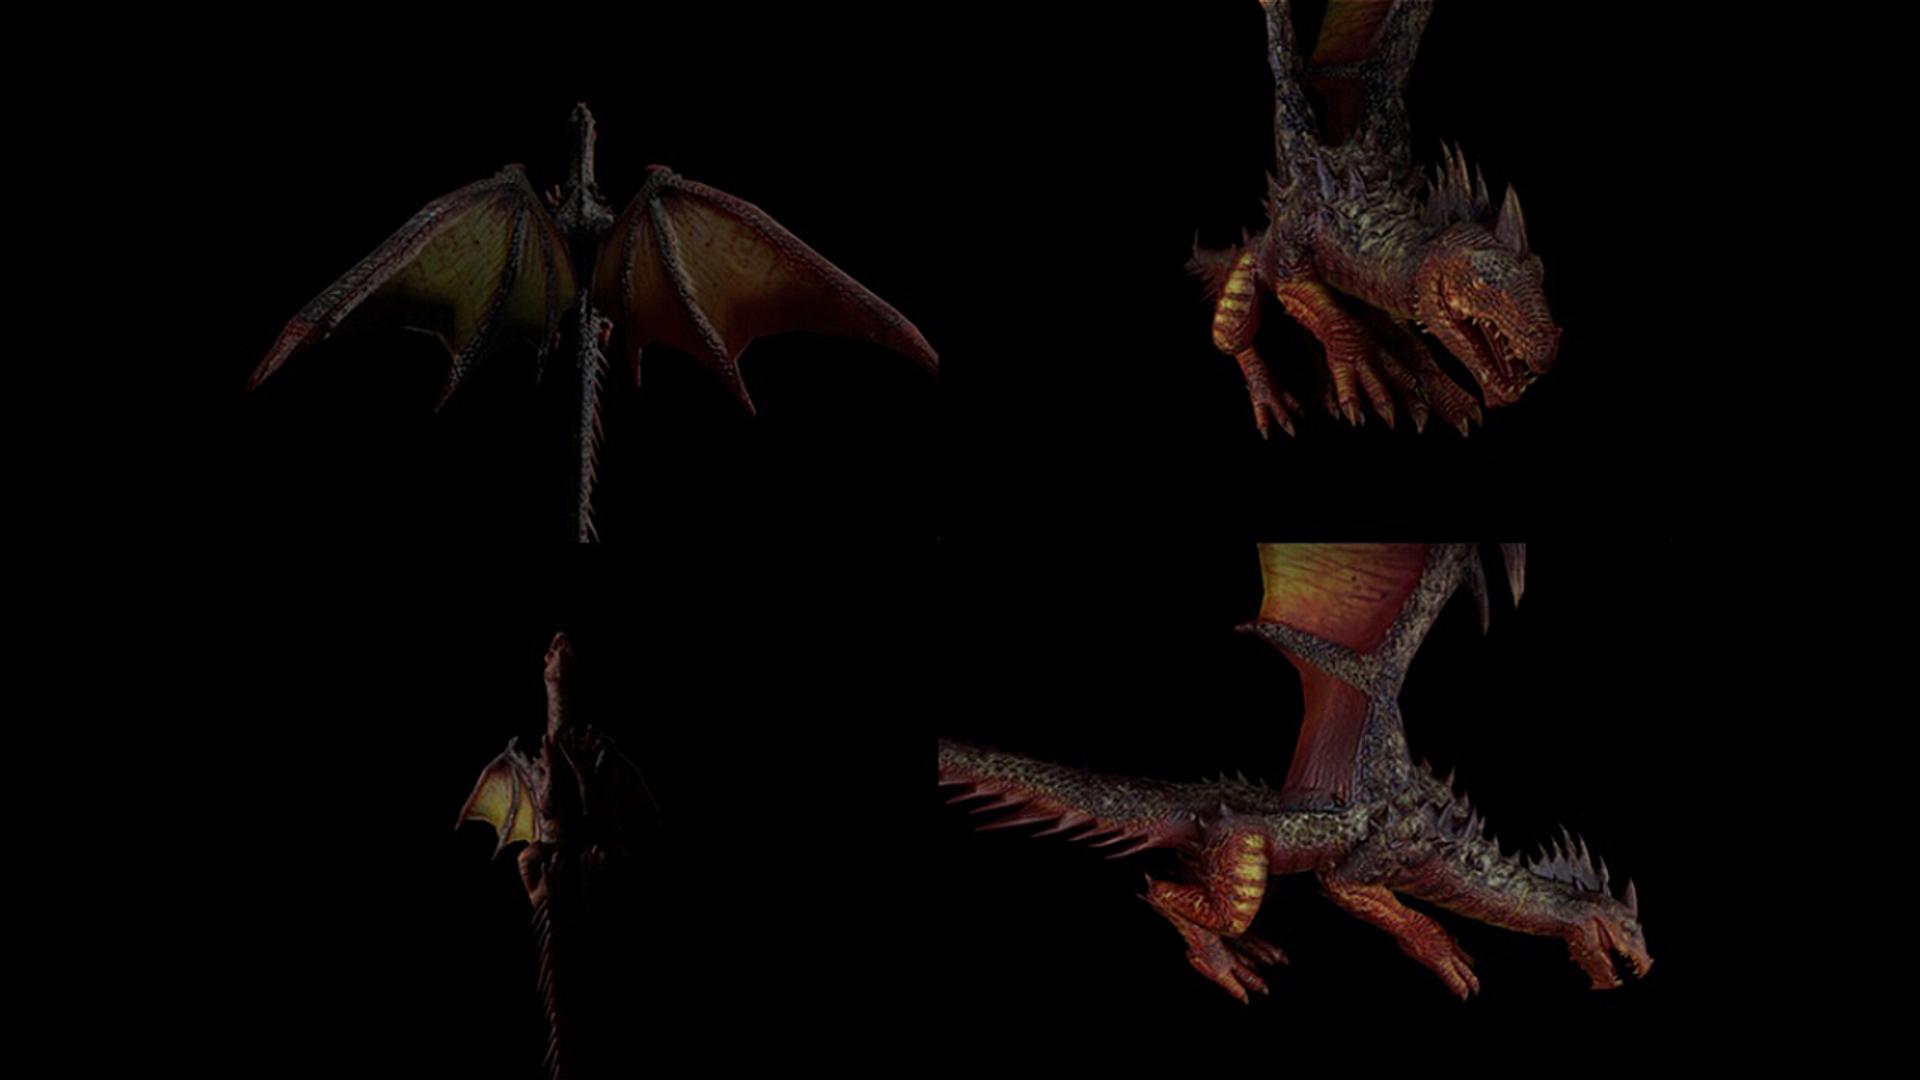 dragonskin02.jpg